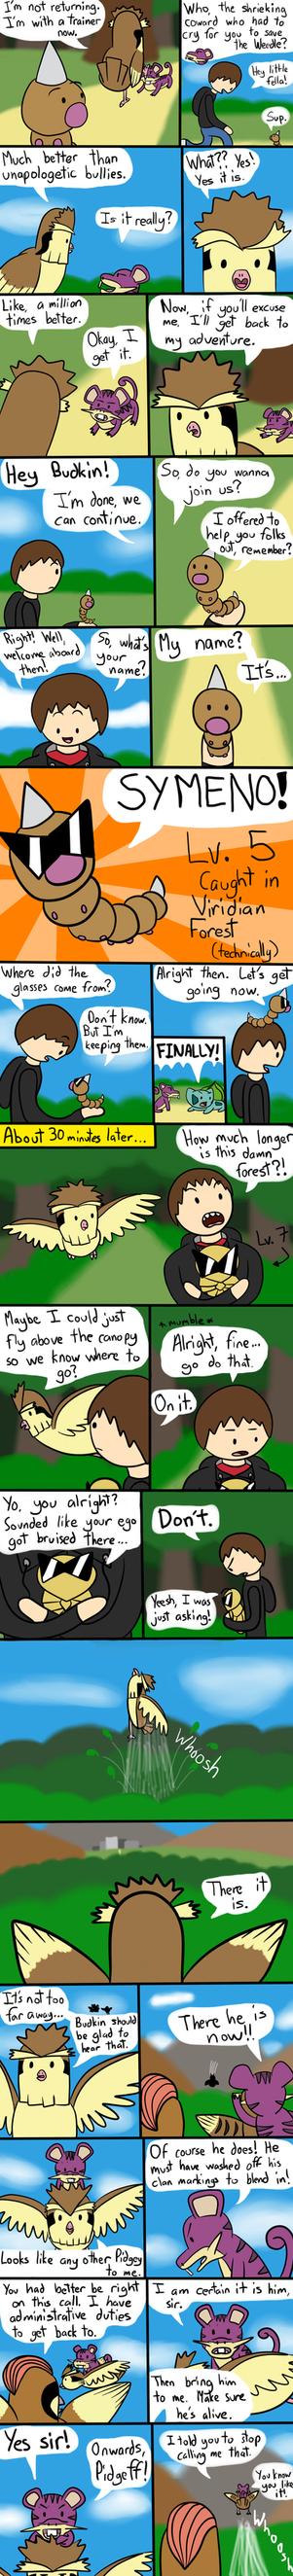 Budkin's Leaf Green Nuzlocke Page 9 by ArtfulRoomsOfDeath